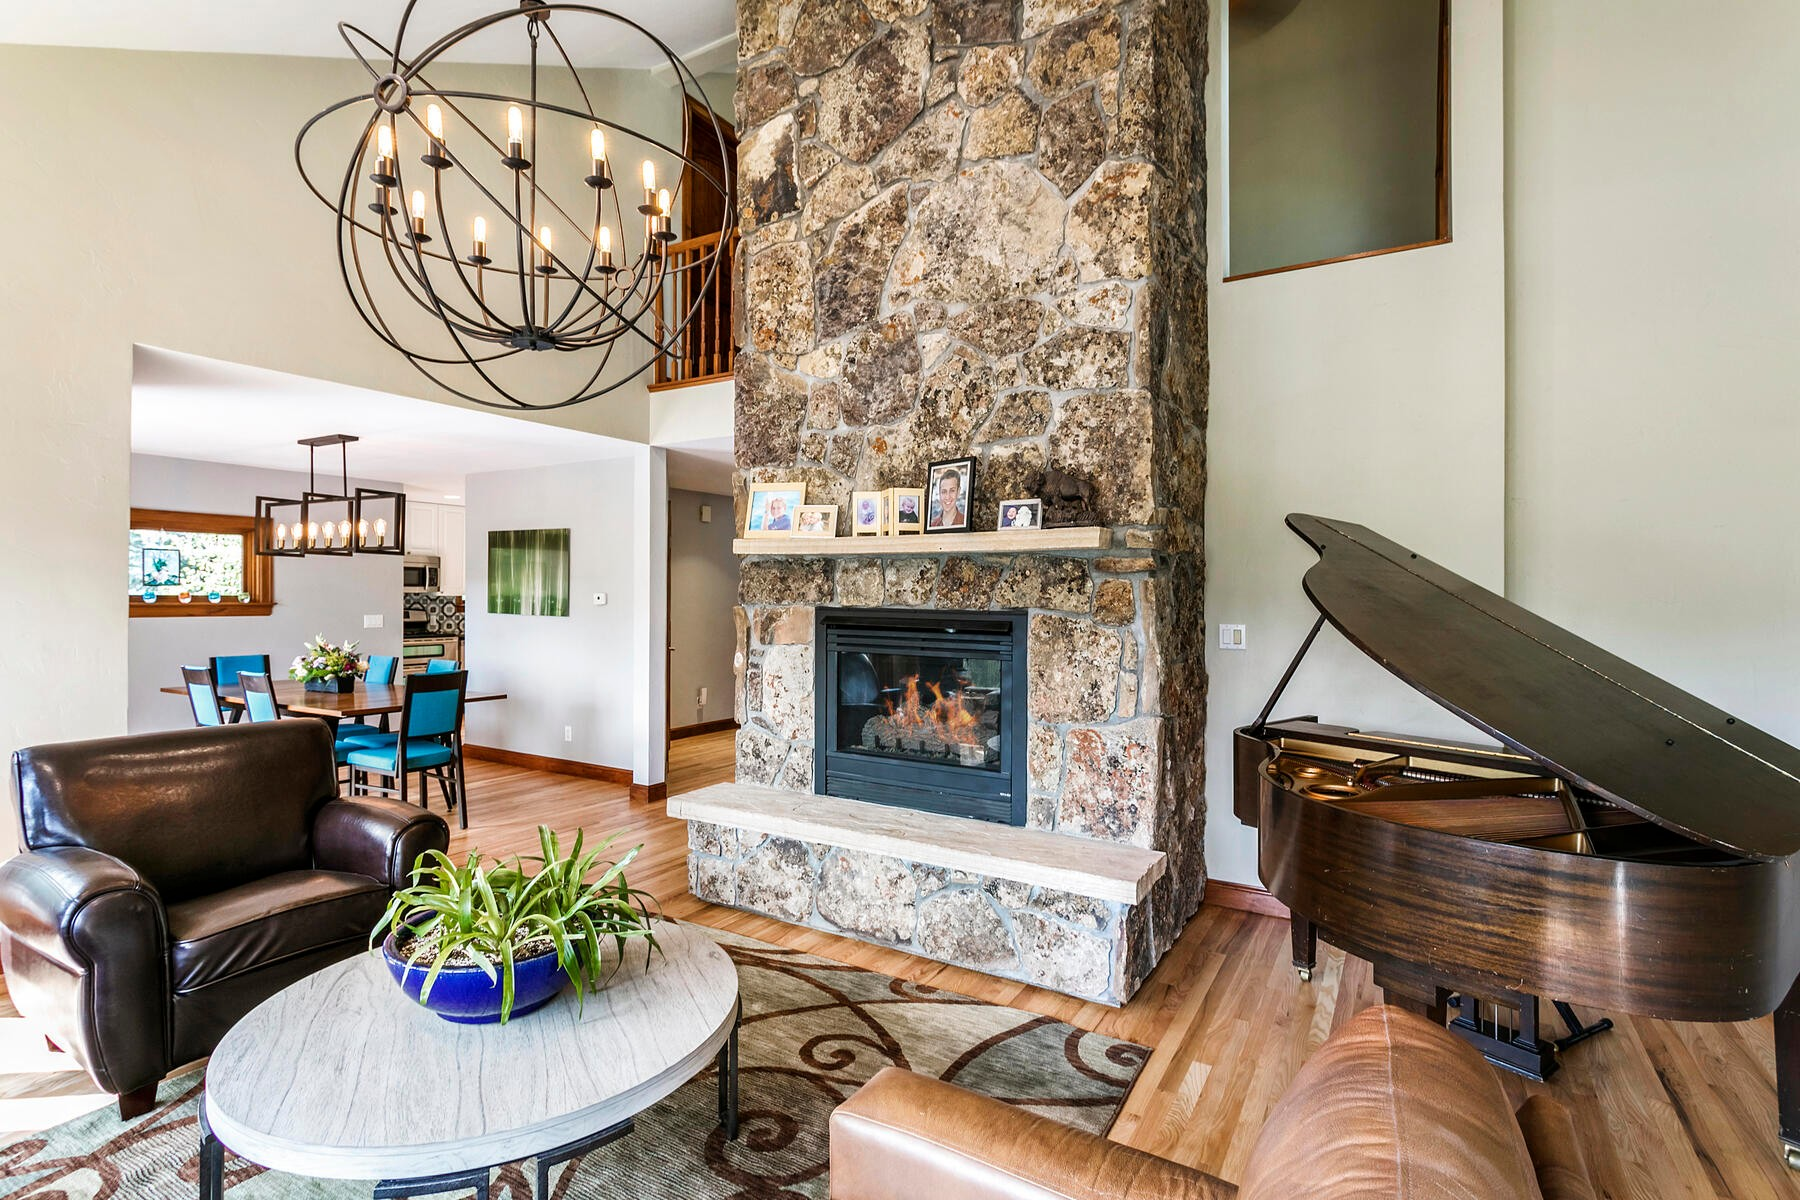 Single Family Homes pour l Vente à Beautifully Updated in Central Homestead 104 Castle Peak Lane, Edwards, Colorado 81632 États-Unis